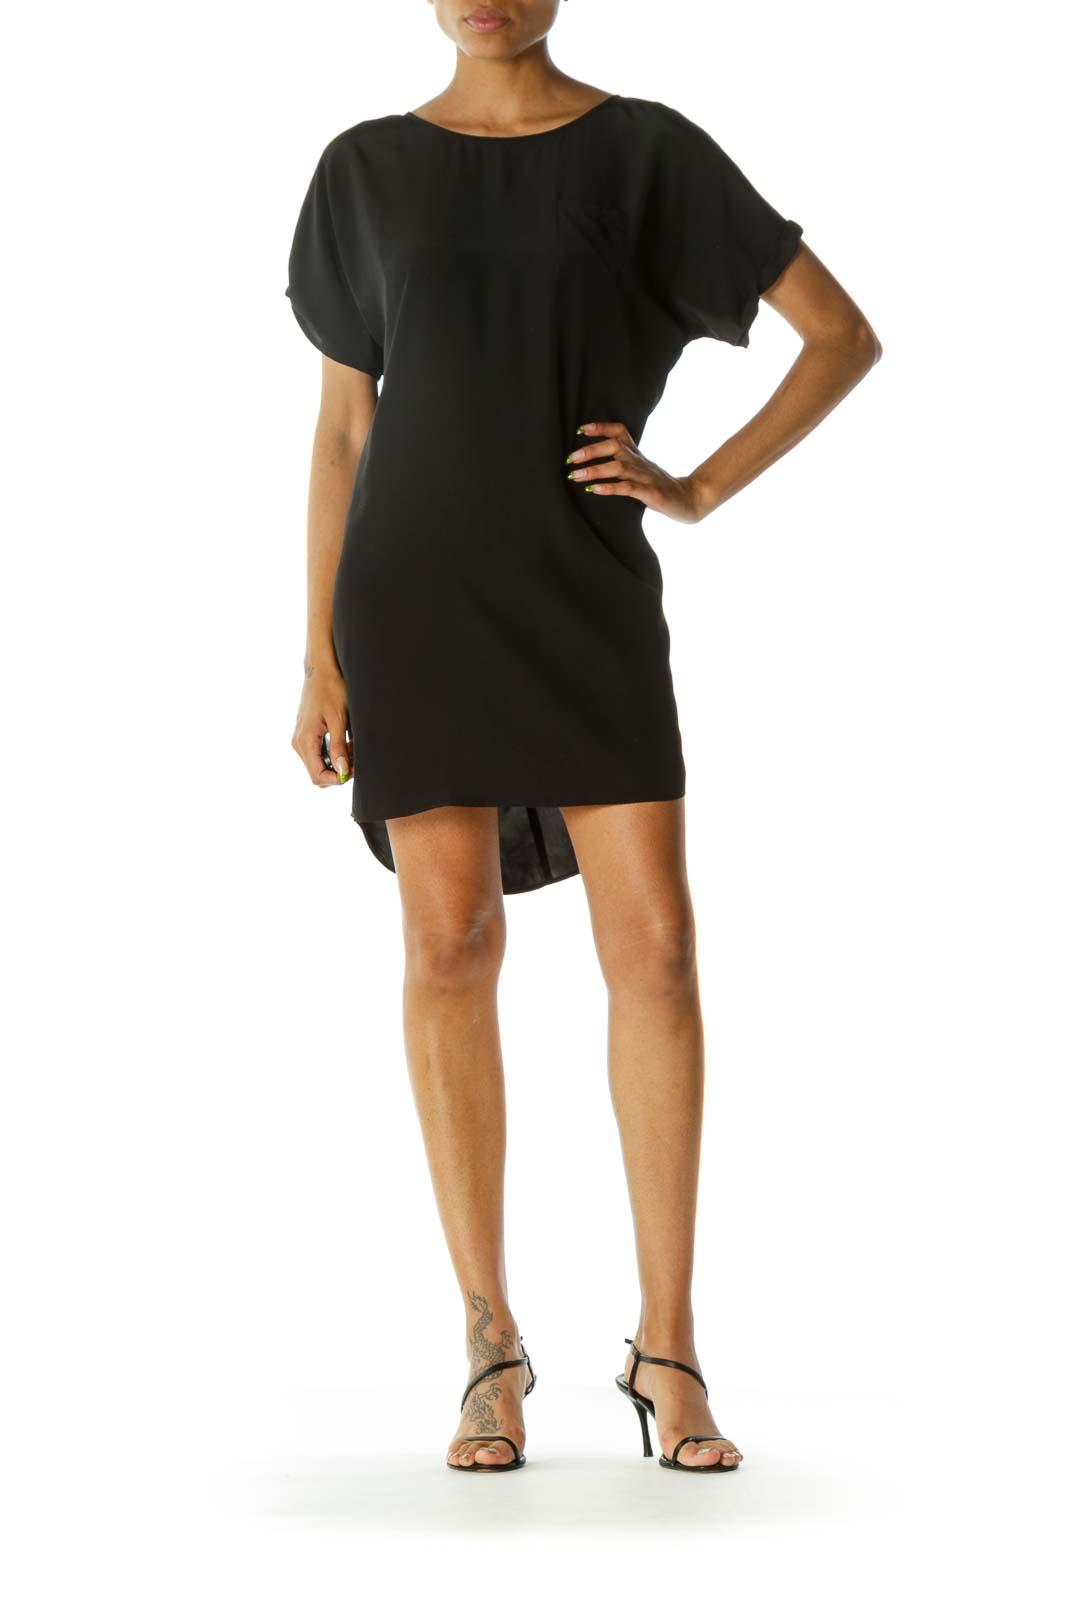 Black Round Neck Short Sleeve Pocket Day Dress